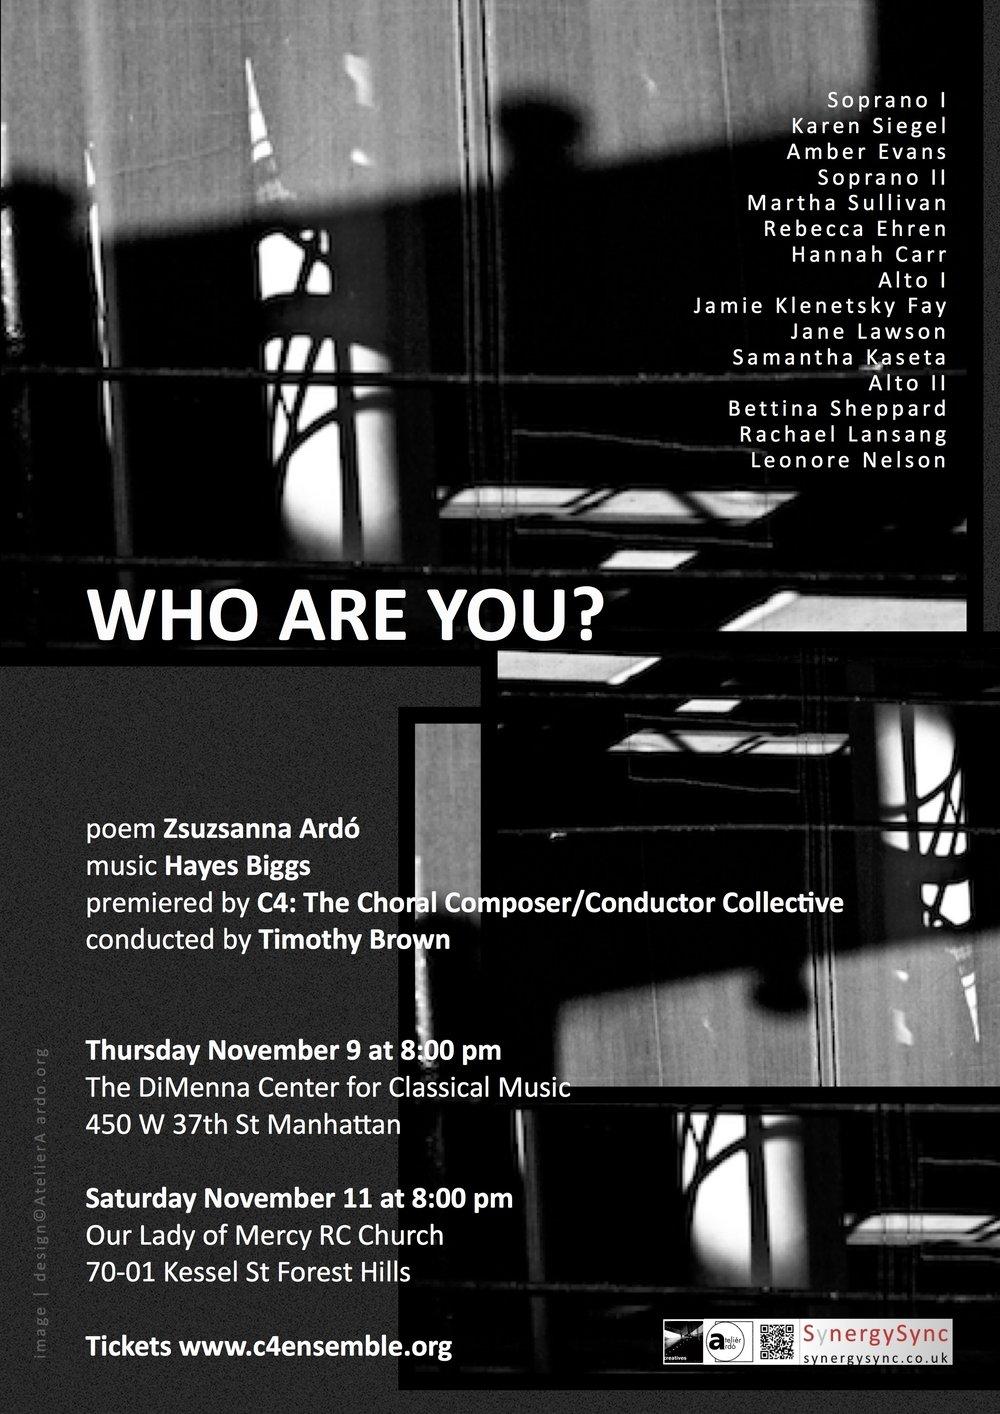 17 US NY C4 Who are you? poster wlist©zArdo.jpg